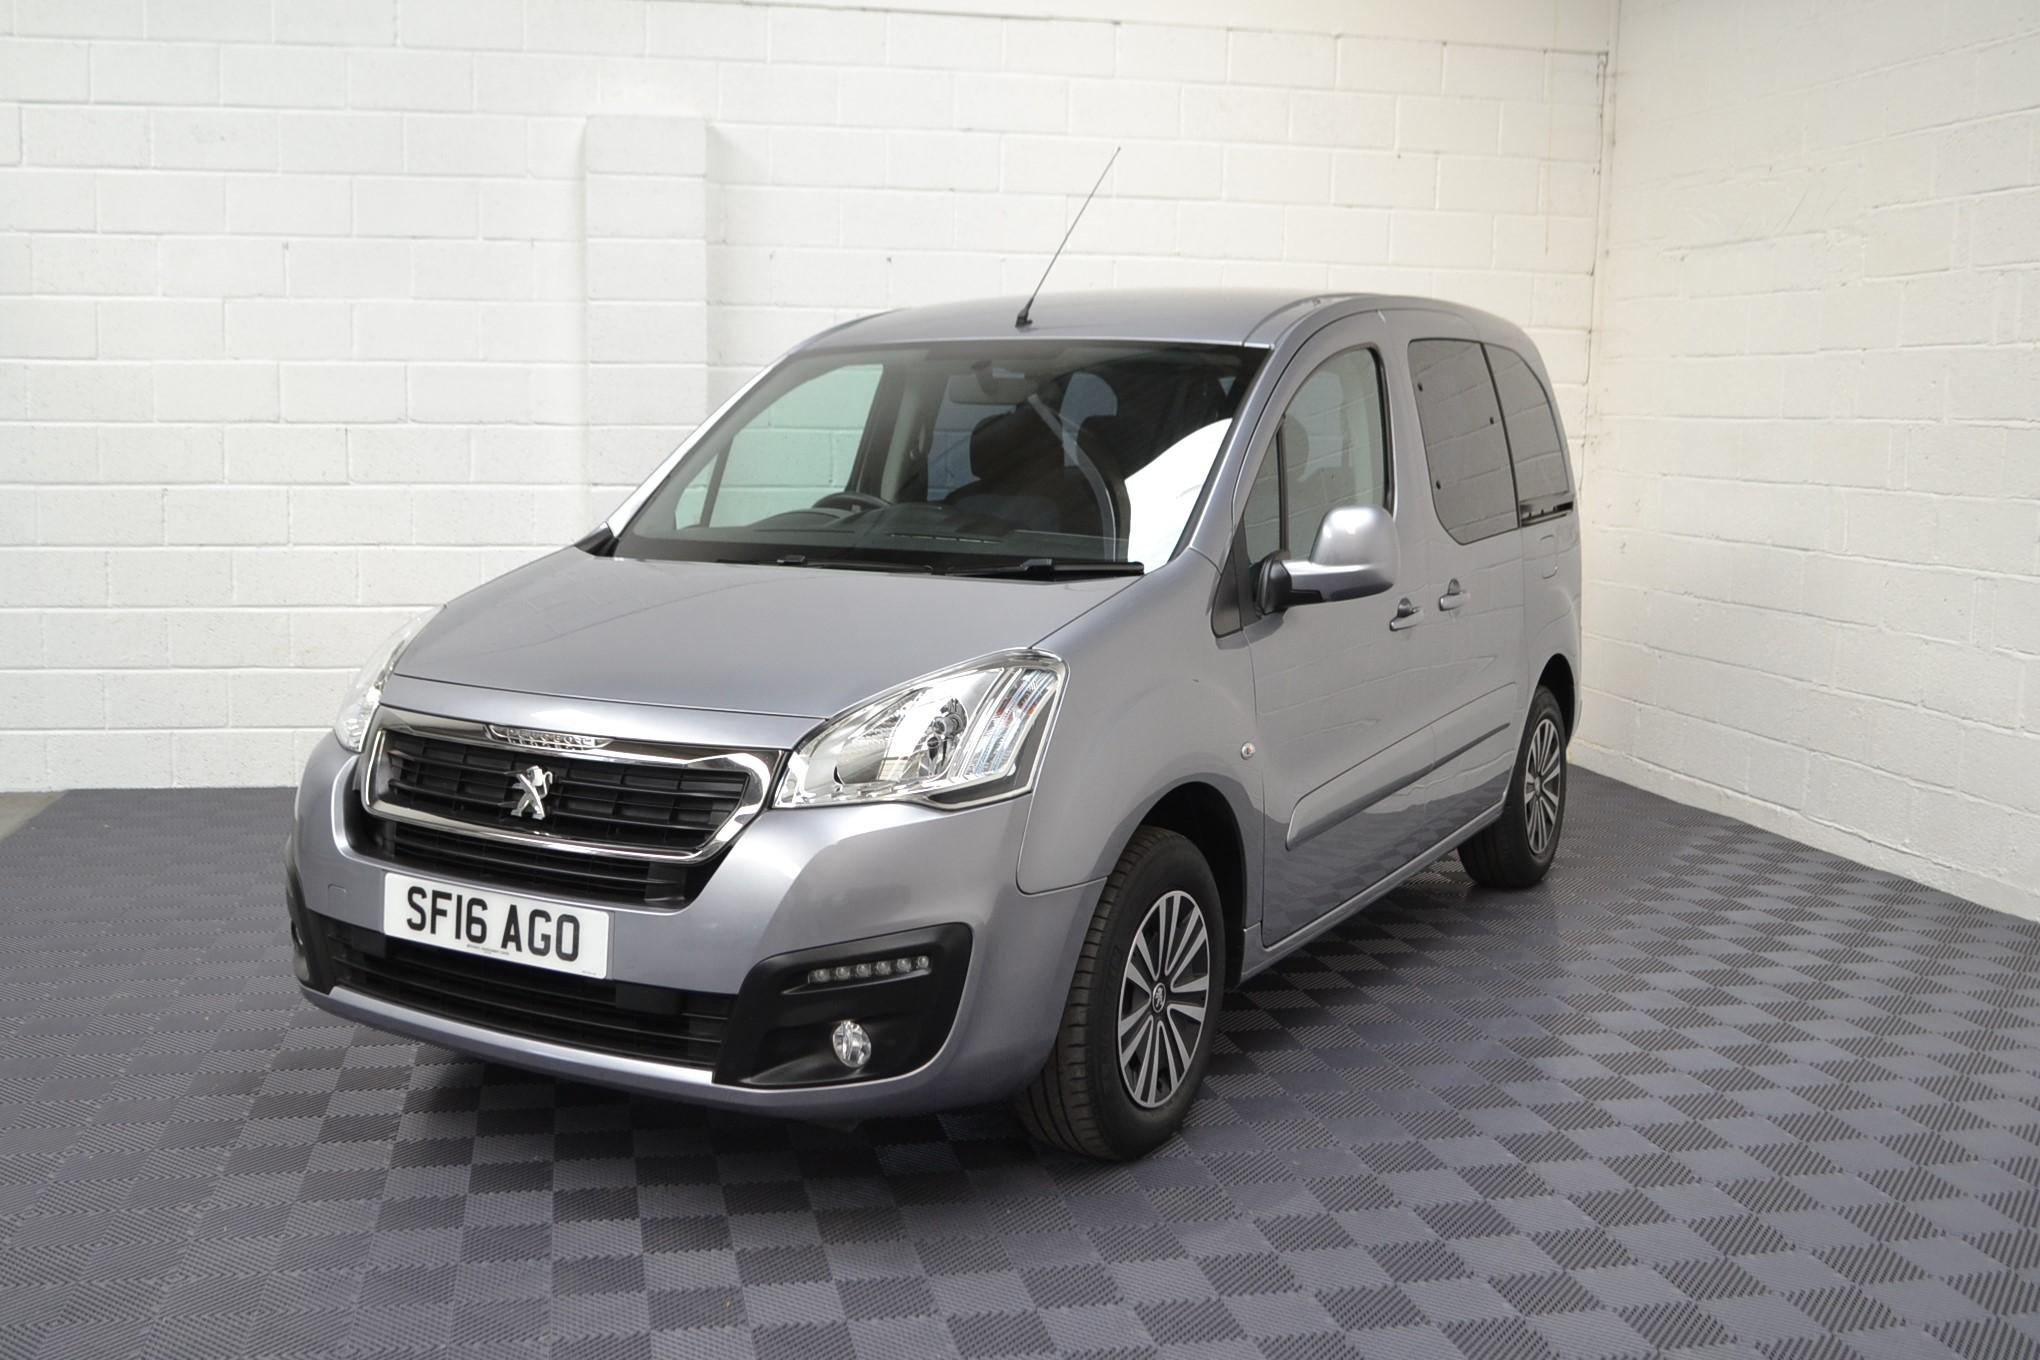 Used Wav Cars for Sale UK Citroen Berlingo WAV Car Peugeot Partner Petrol Wheelchair Accessible Vehicles Buy Sell Bristol Somerset Devon Dorset 16